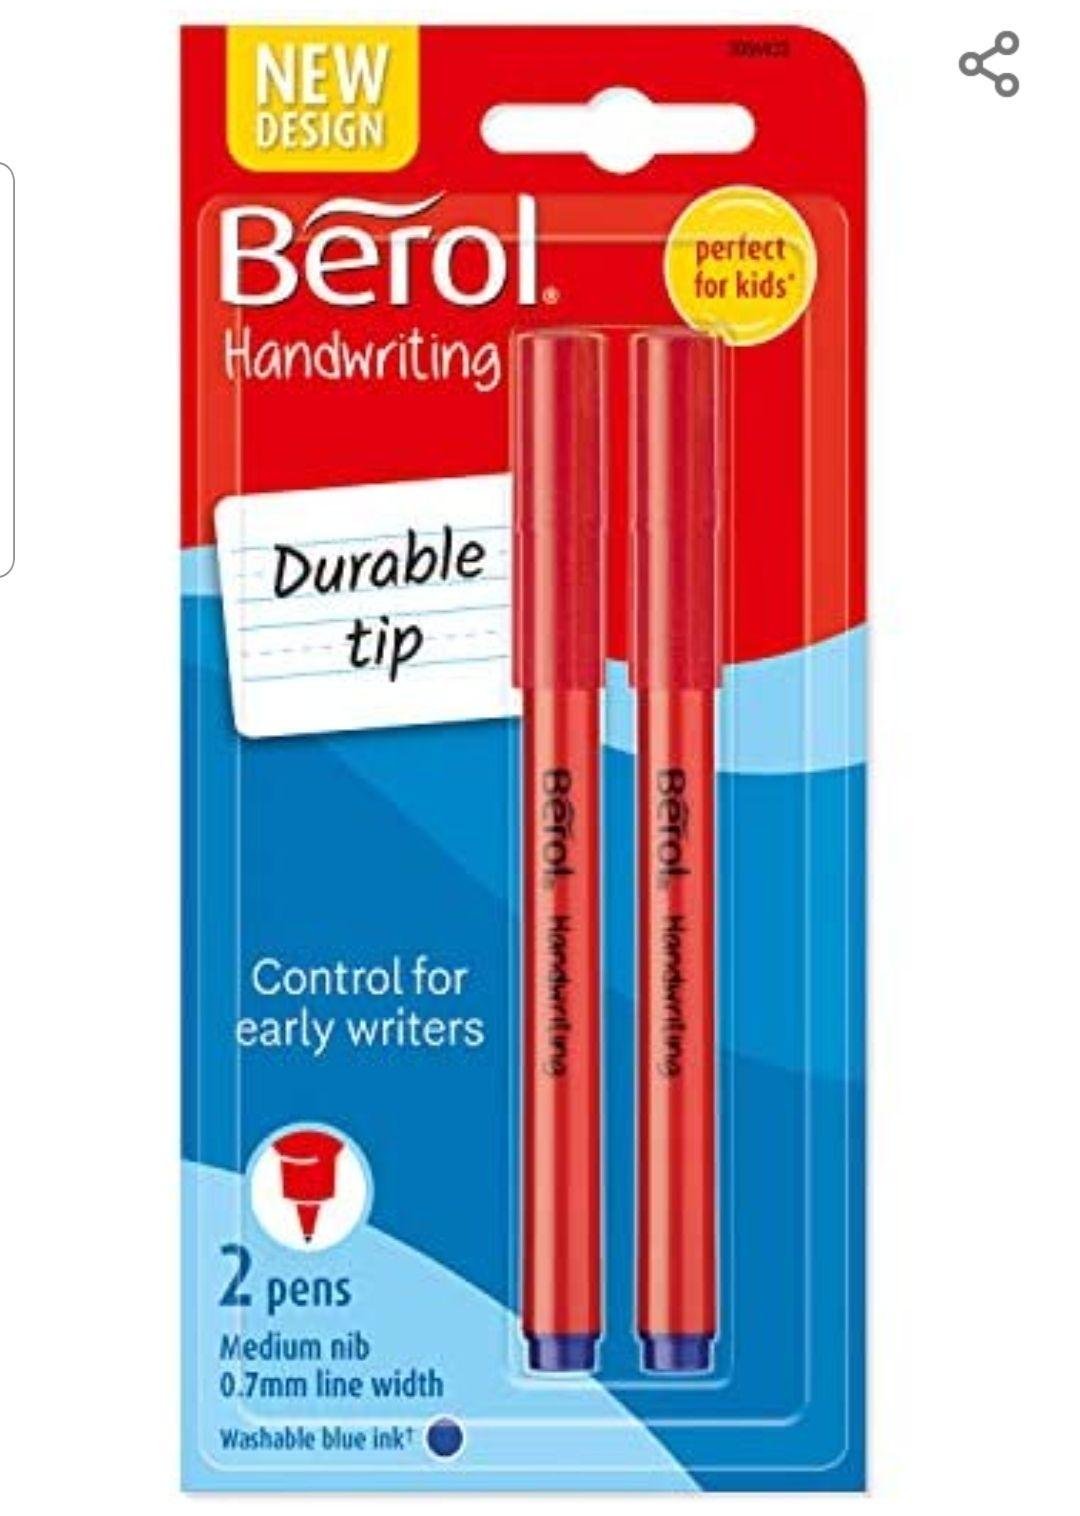 Berol Handwriting Pens Round Shape, Washable Blue Ink, Bright Barrels, 2 Count £1.75 prime / £6.24 nonPrime @ Amazon